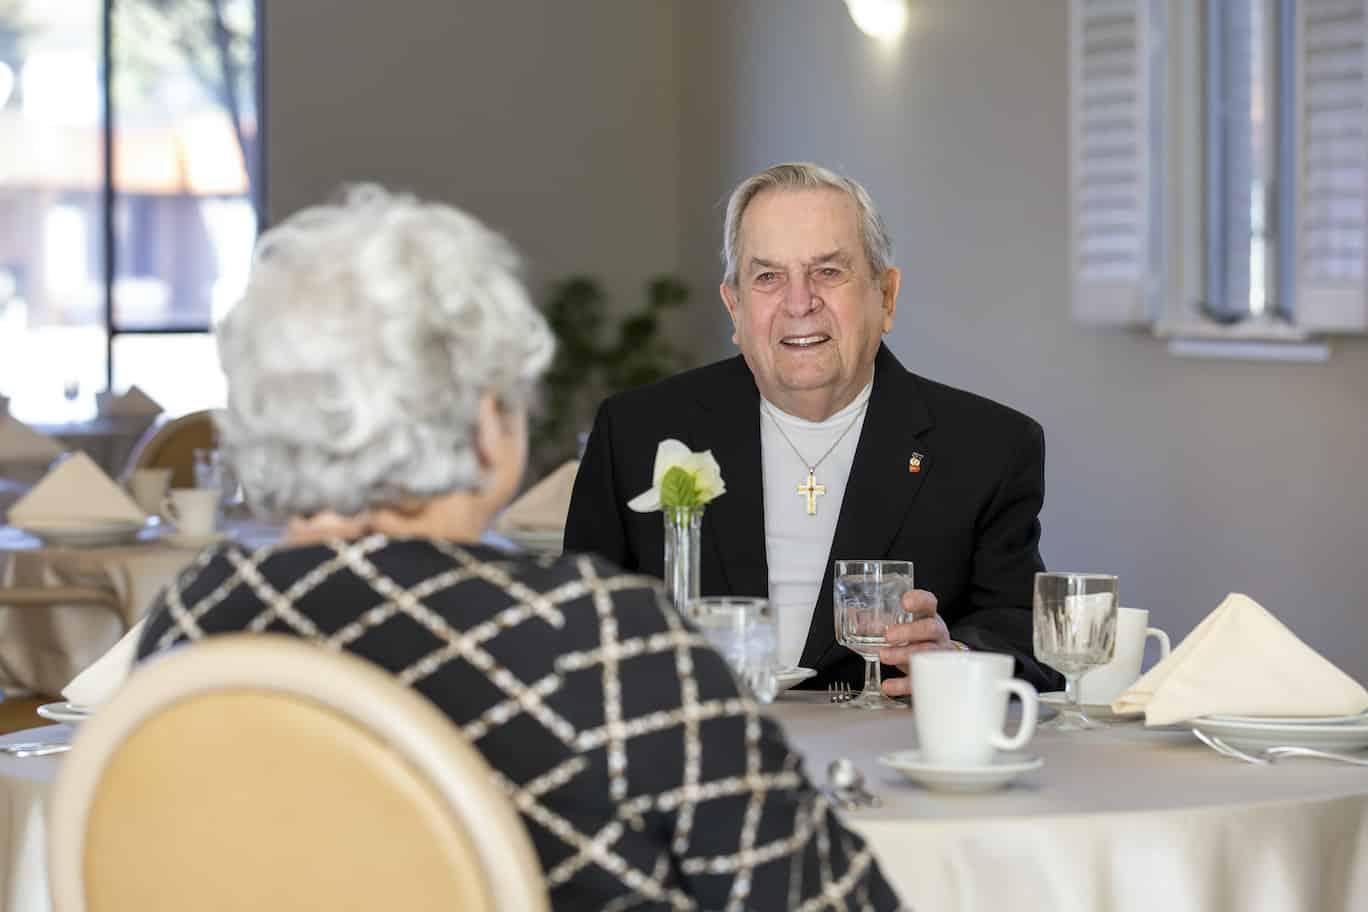 Senior man smiling at dining table